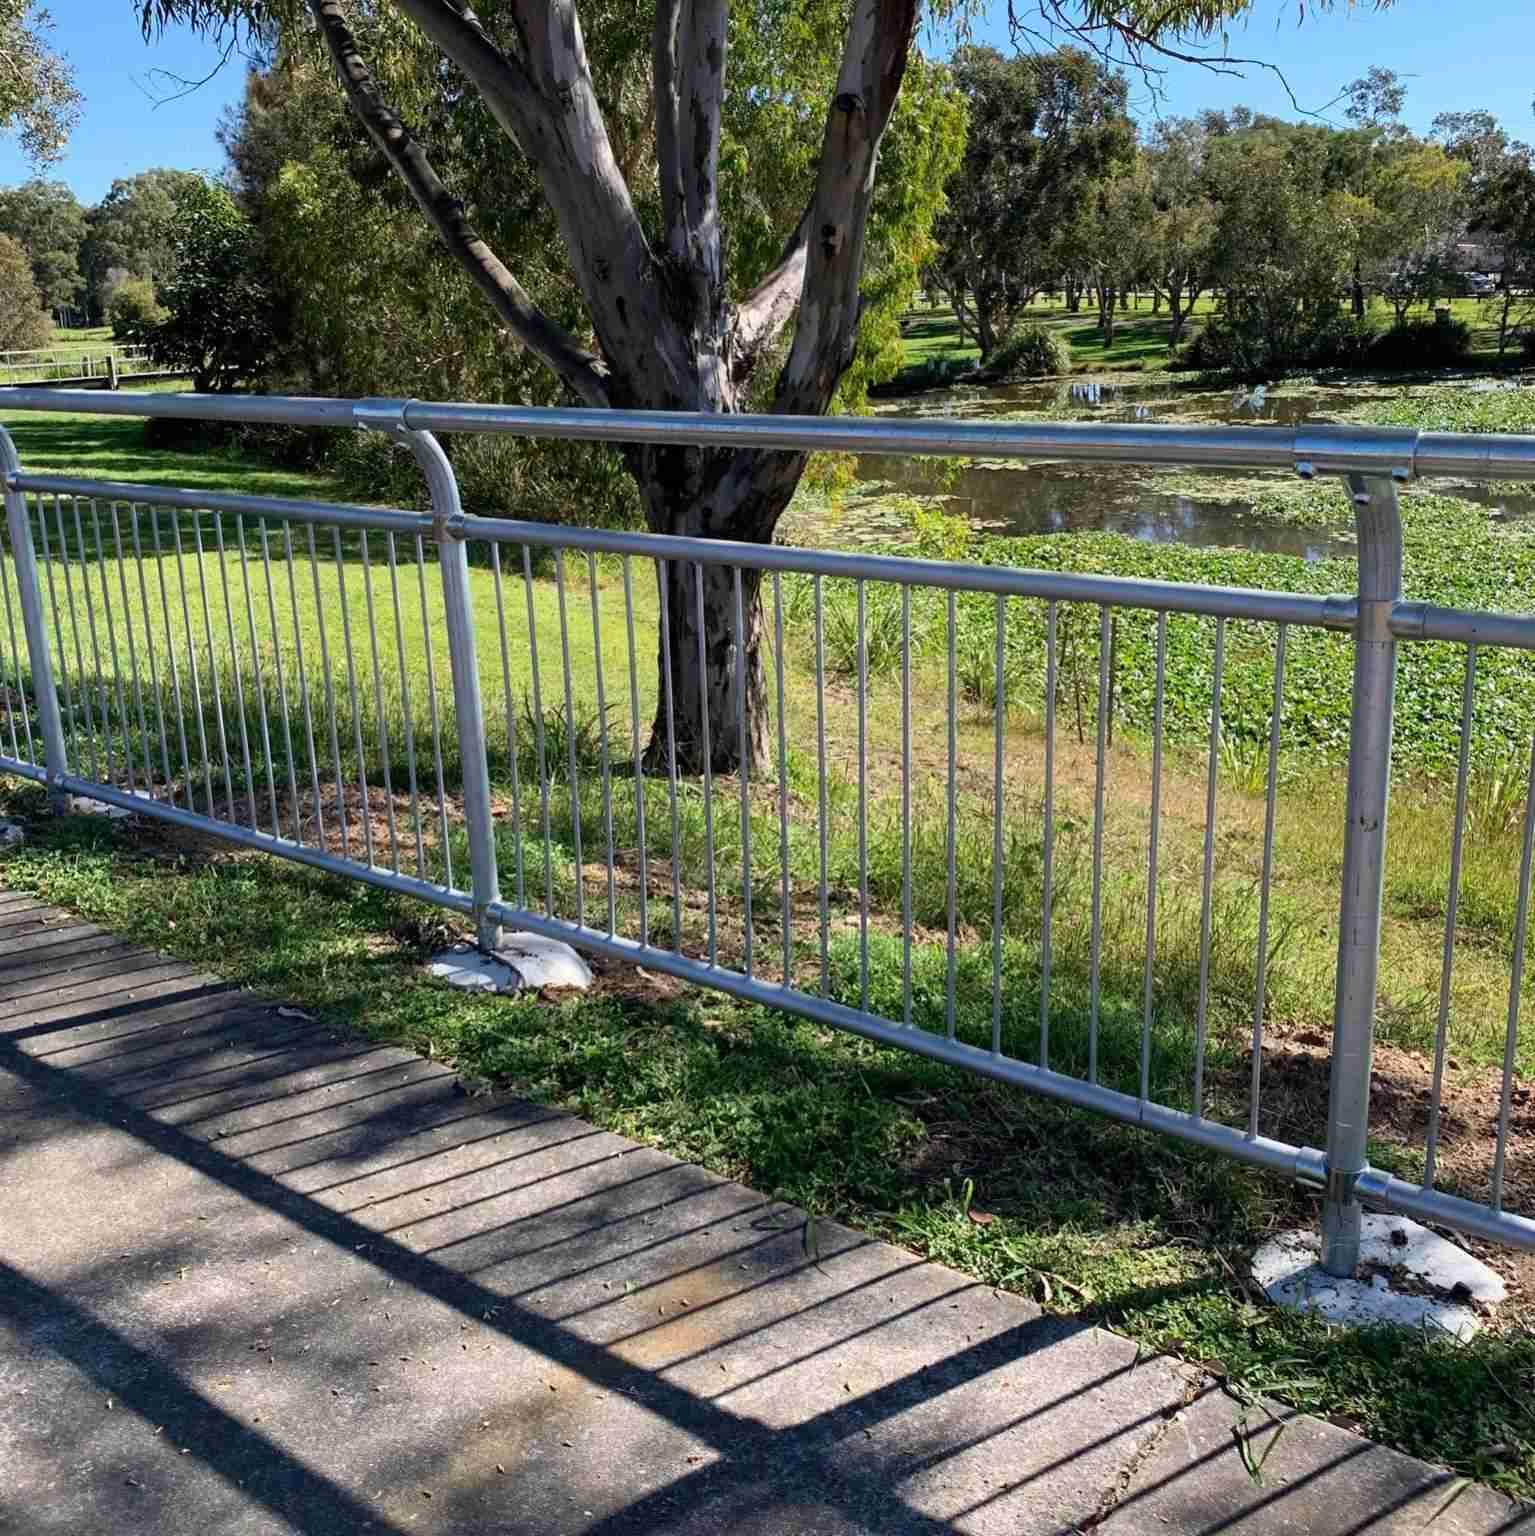 Bikeway Safety Barrier System - BSD 7006 compliant